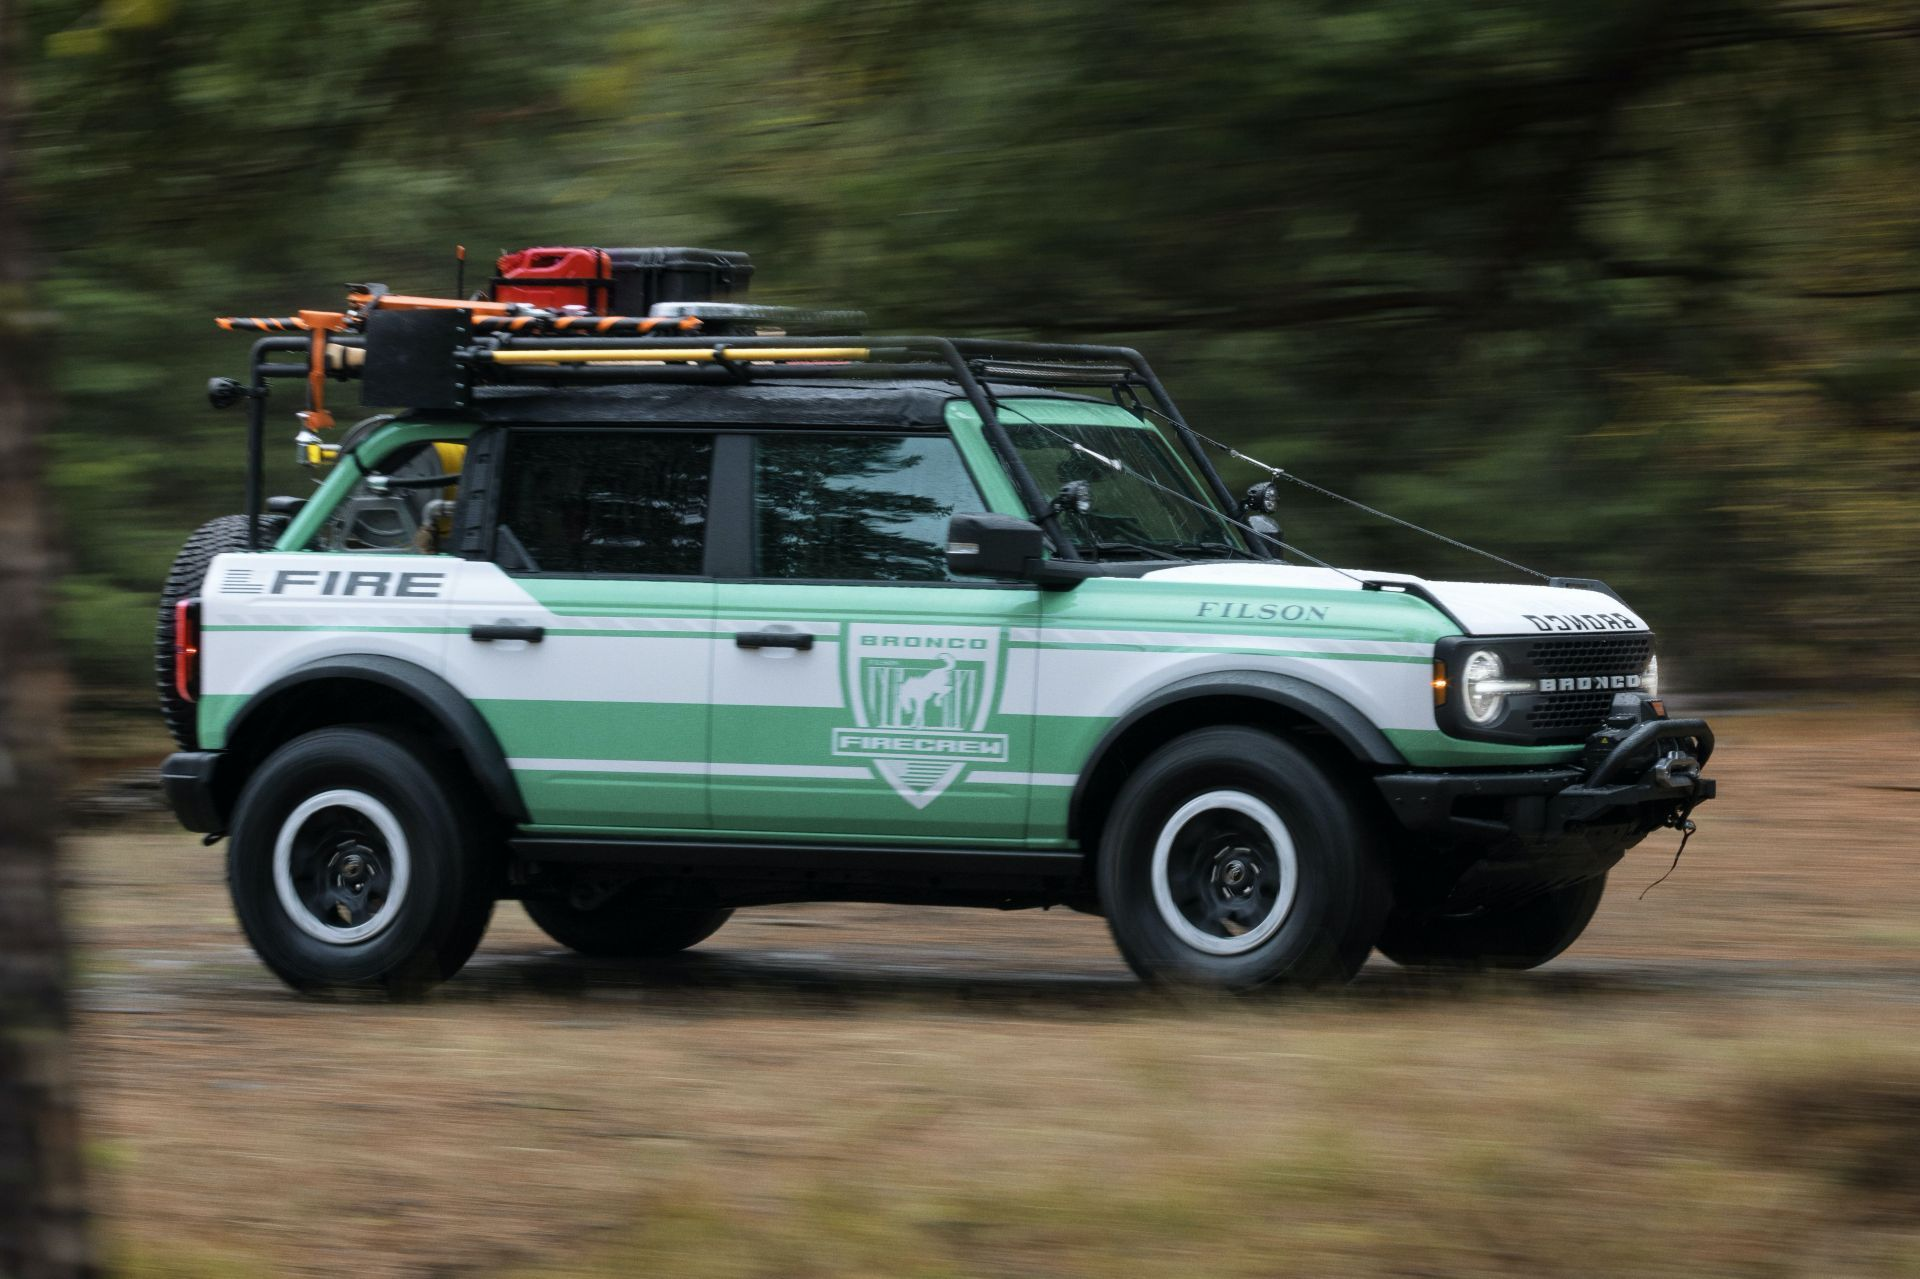 Ford-Bronco-Wildland-Fire-Rig-Concept-4